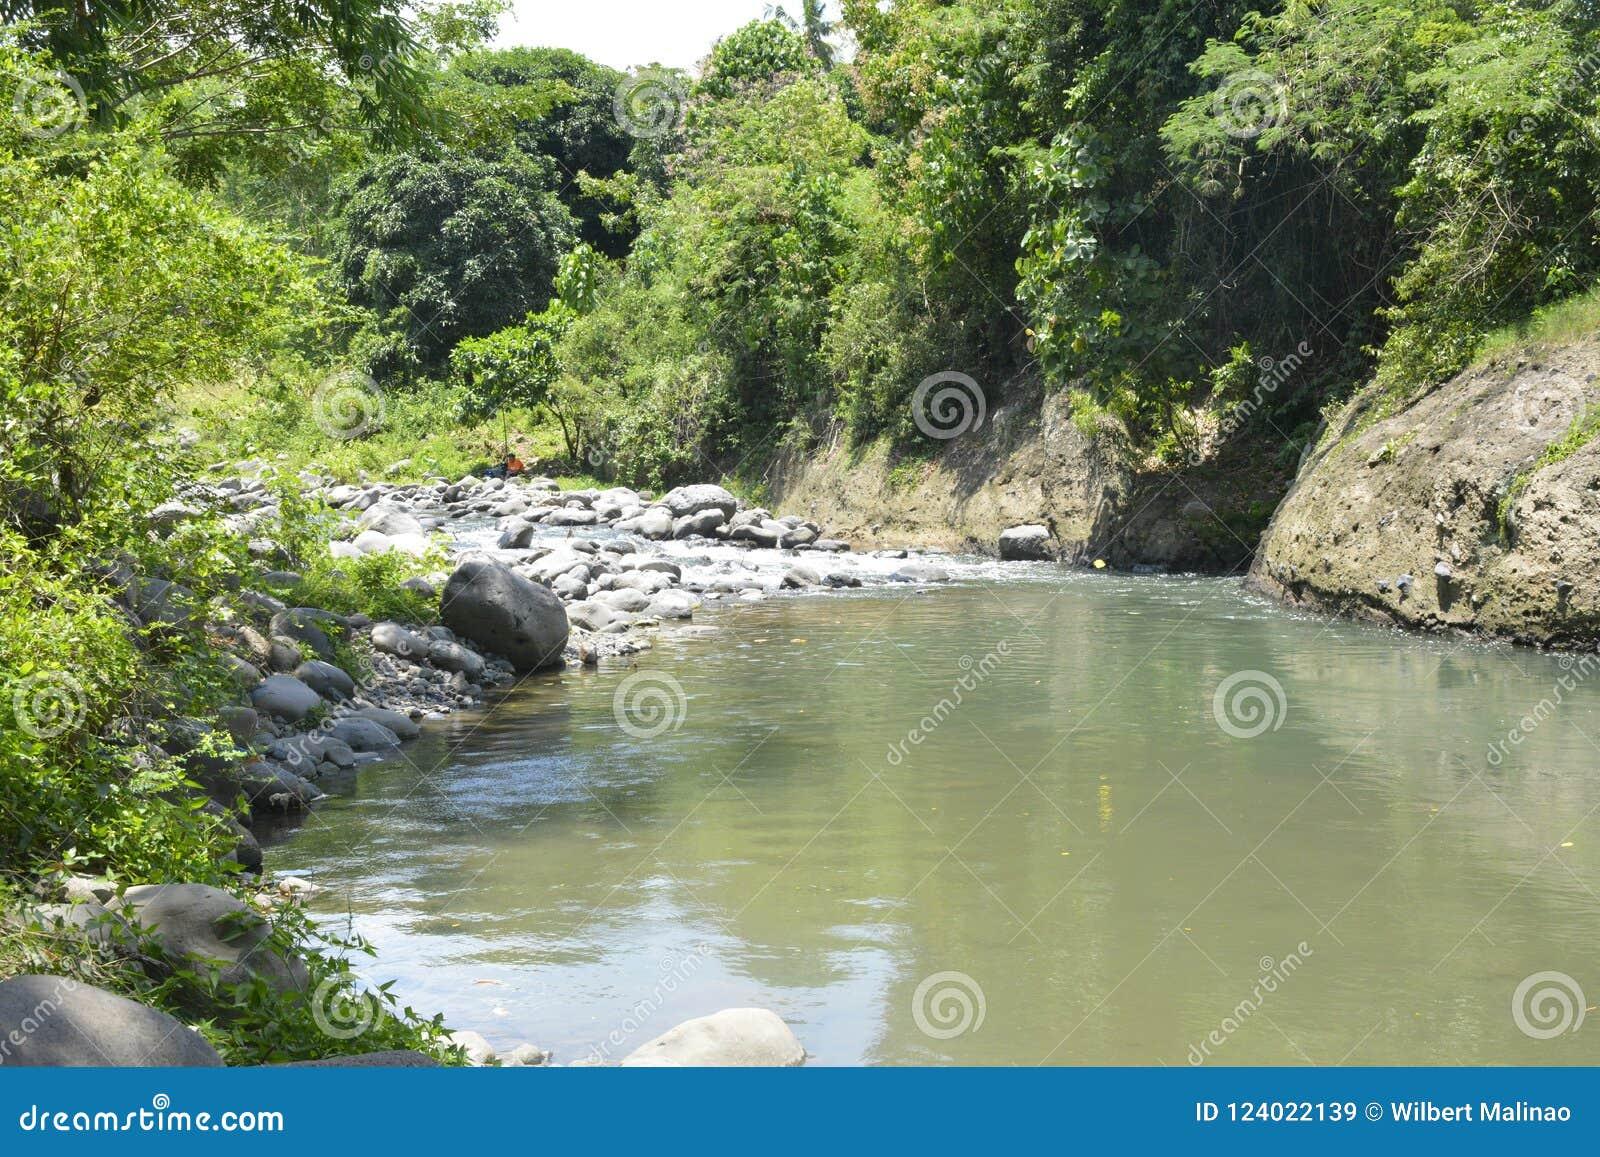 Rotsachtig gedeelte van Ruparan-rivier in barangay Ruparan, Digos-Stad, Davao del Sur, Filippijnen